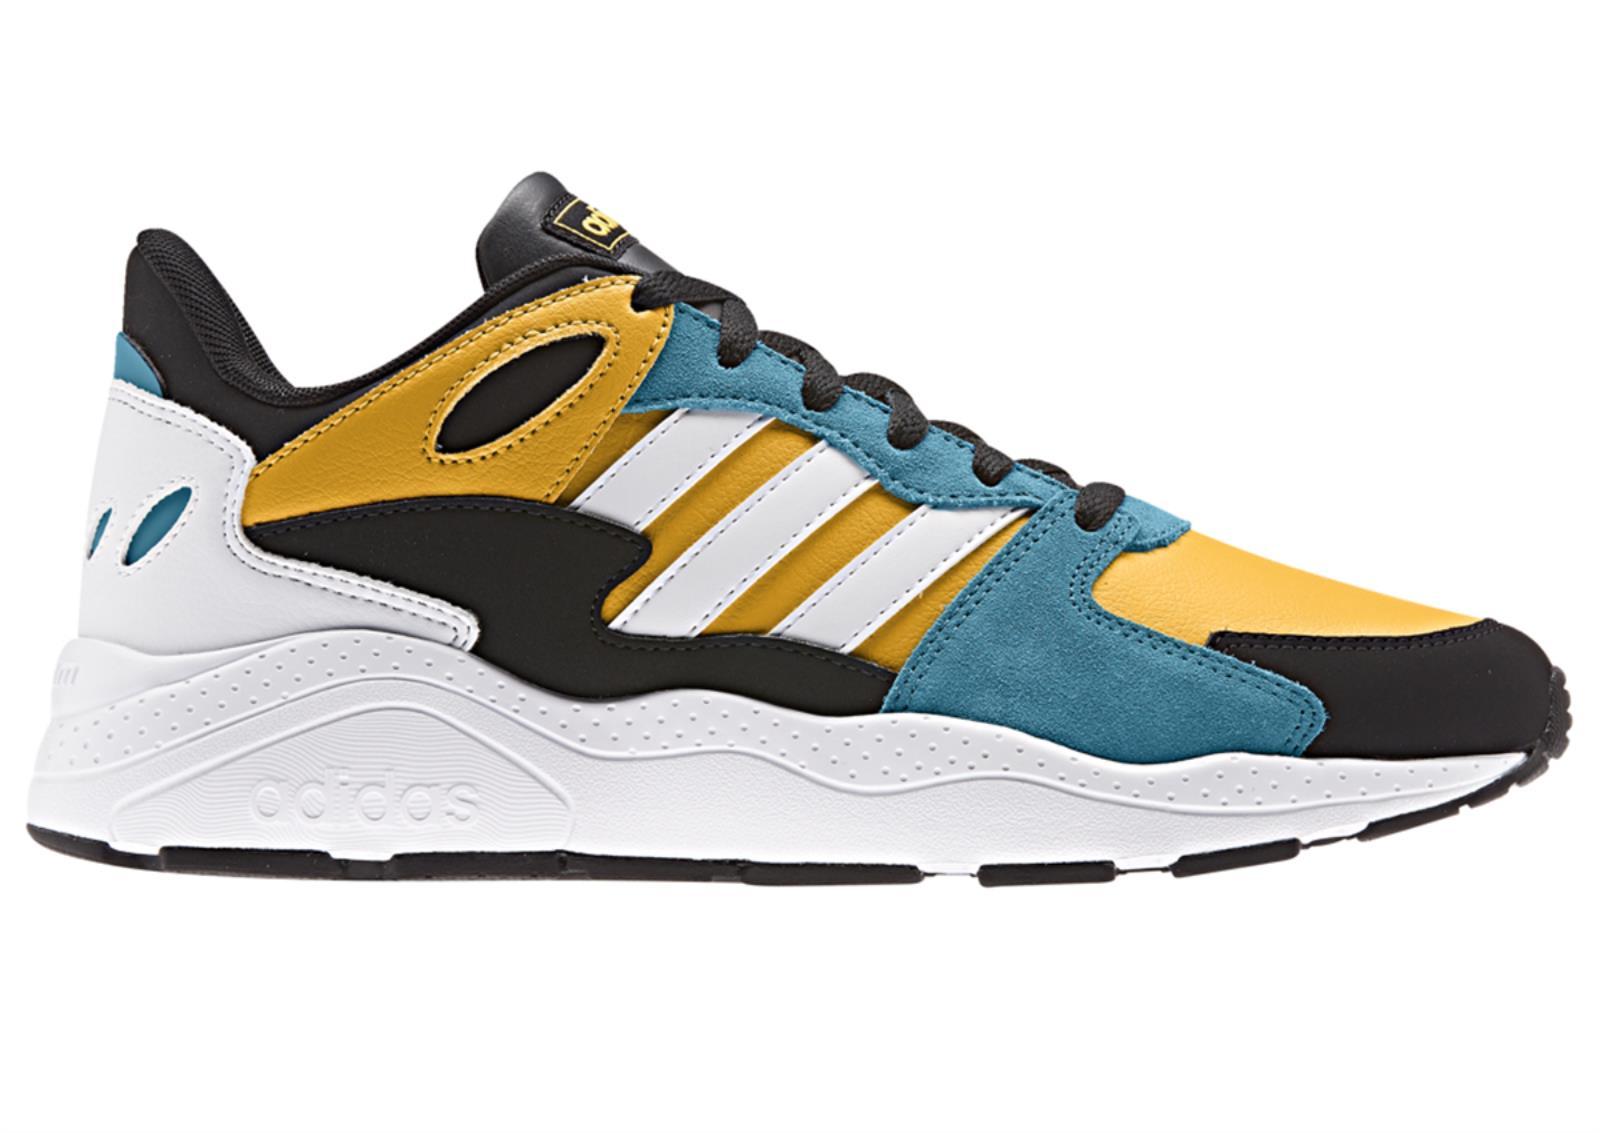 Sneakers Adidas crazy chaos - scarpe da ginnastica uomo